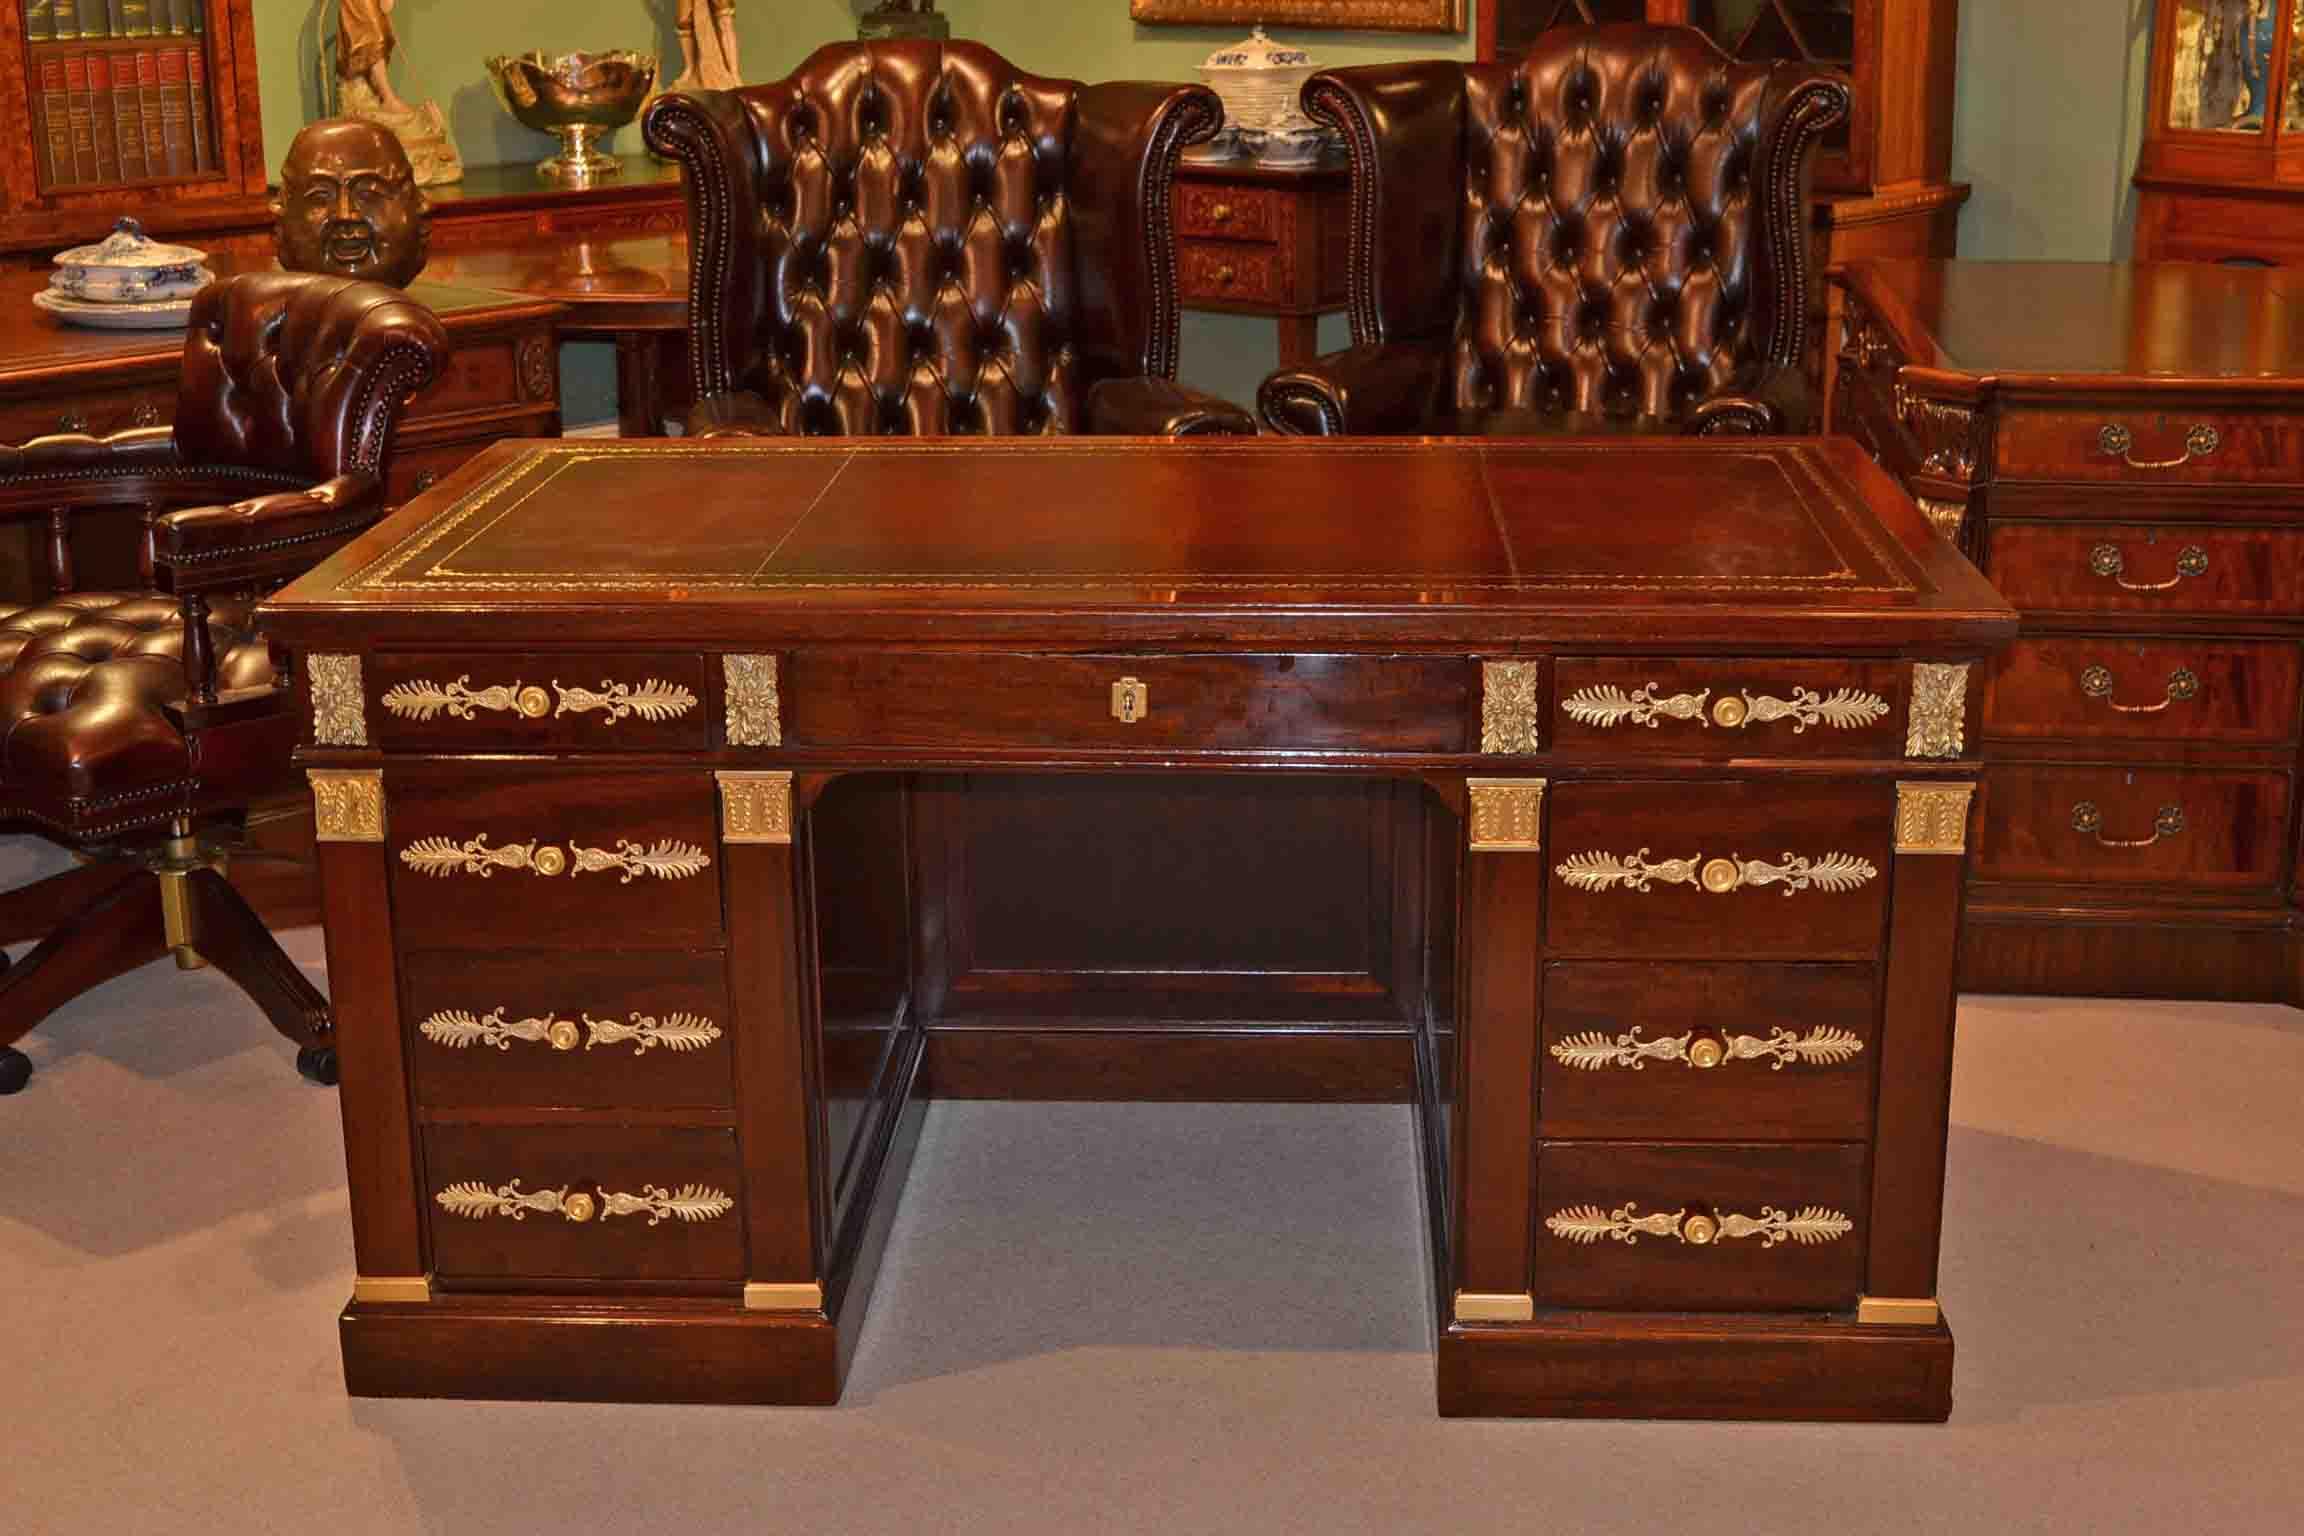 Antique French Empire Ormoulu Mounted Pedestal Desk Ref